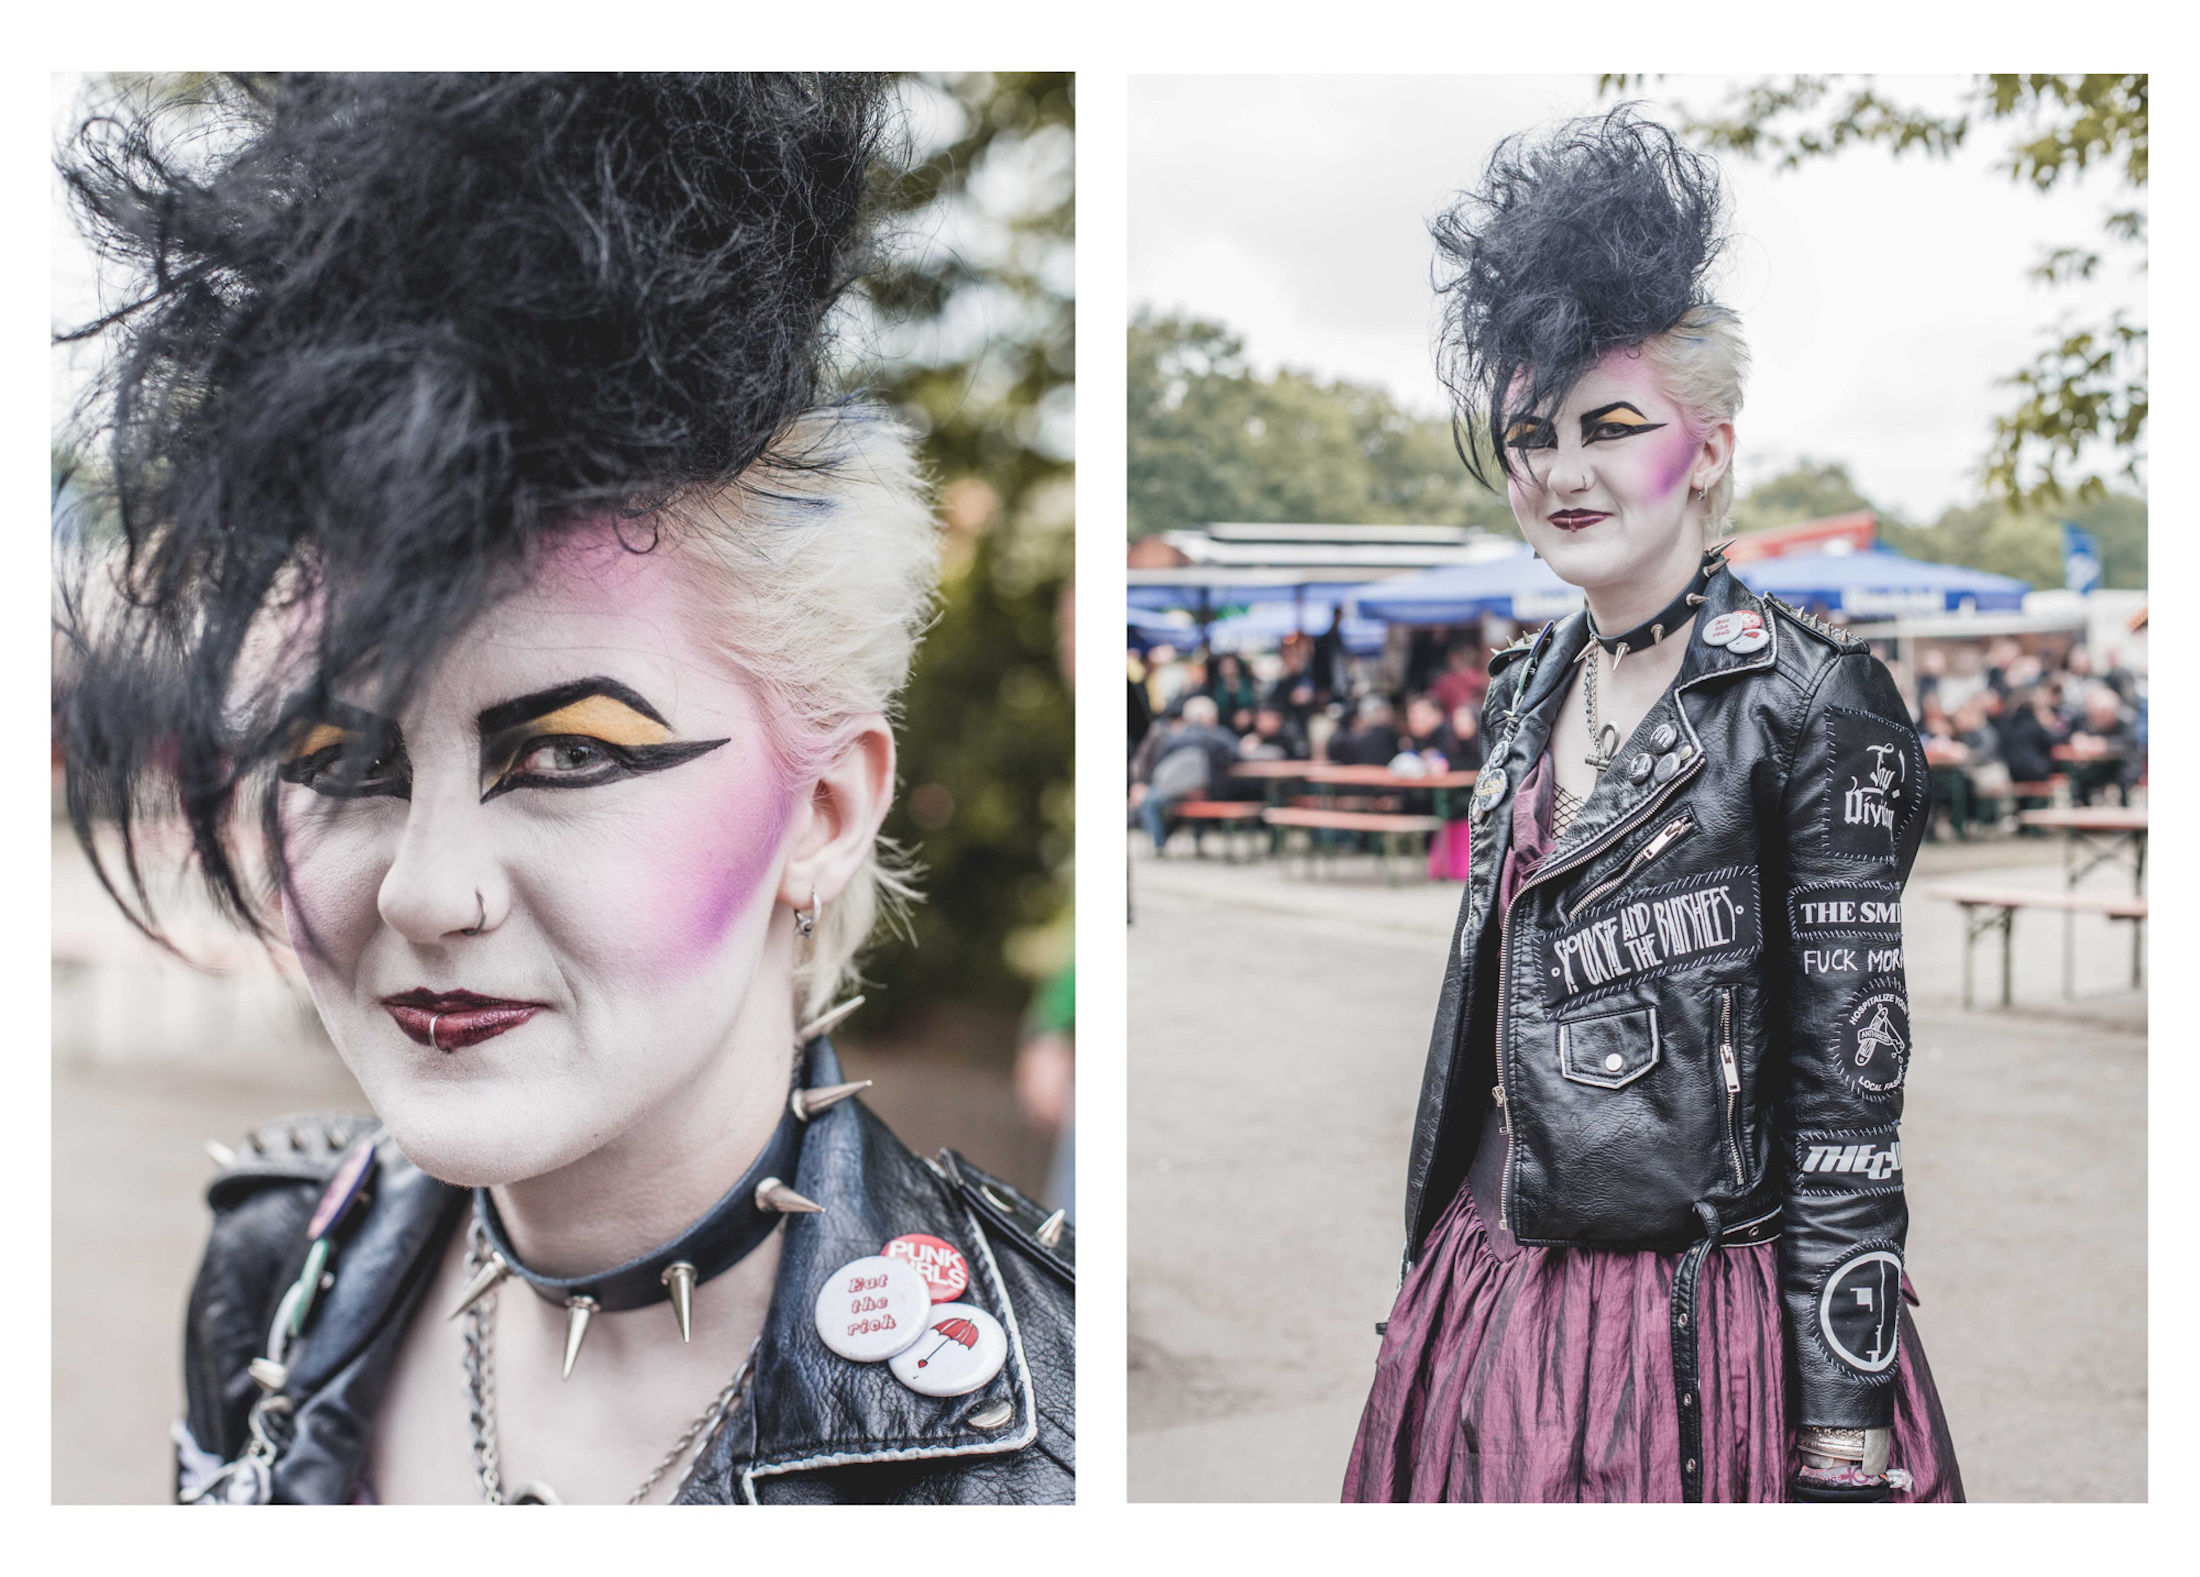 Goth dating non goths